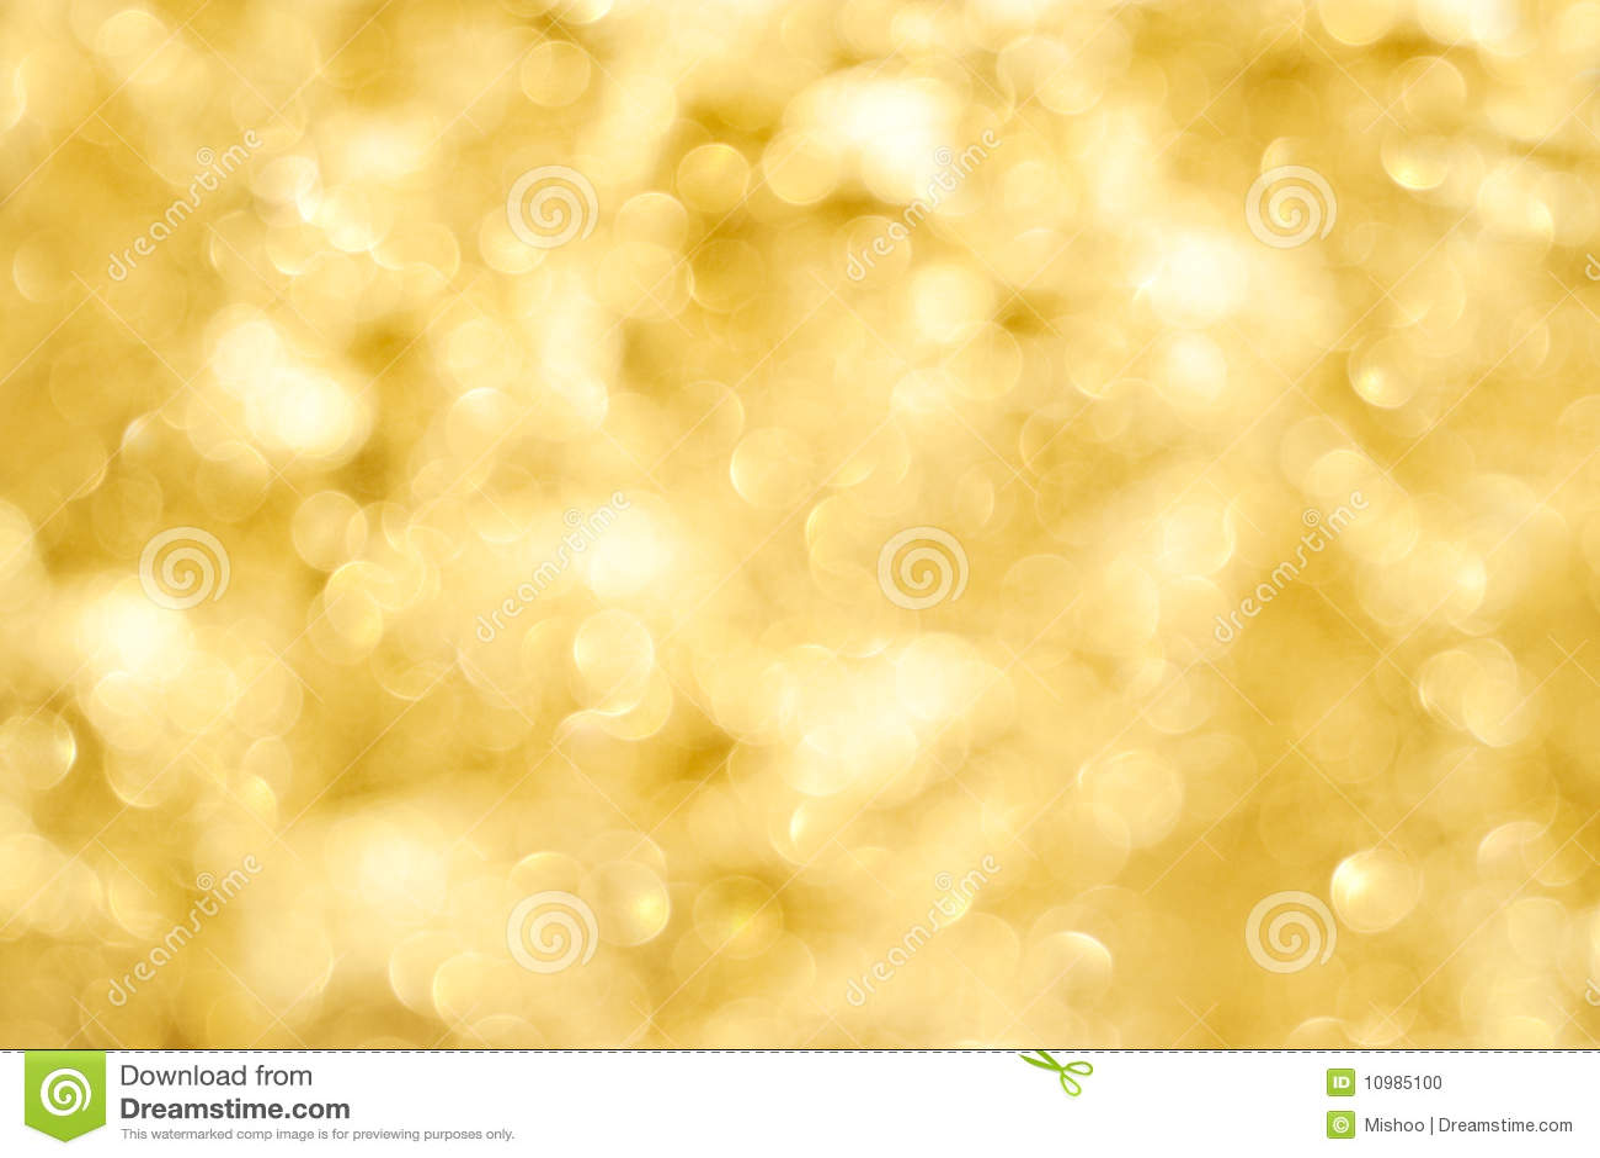 Golden Light Background Stock Photo Image 10985100